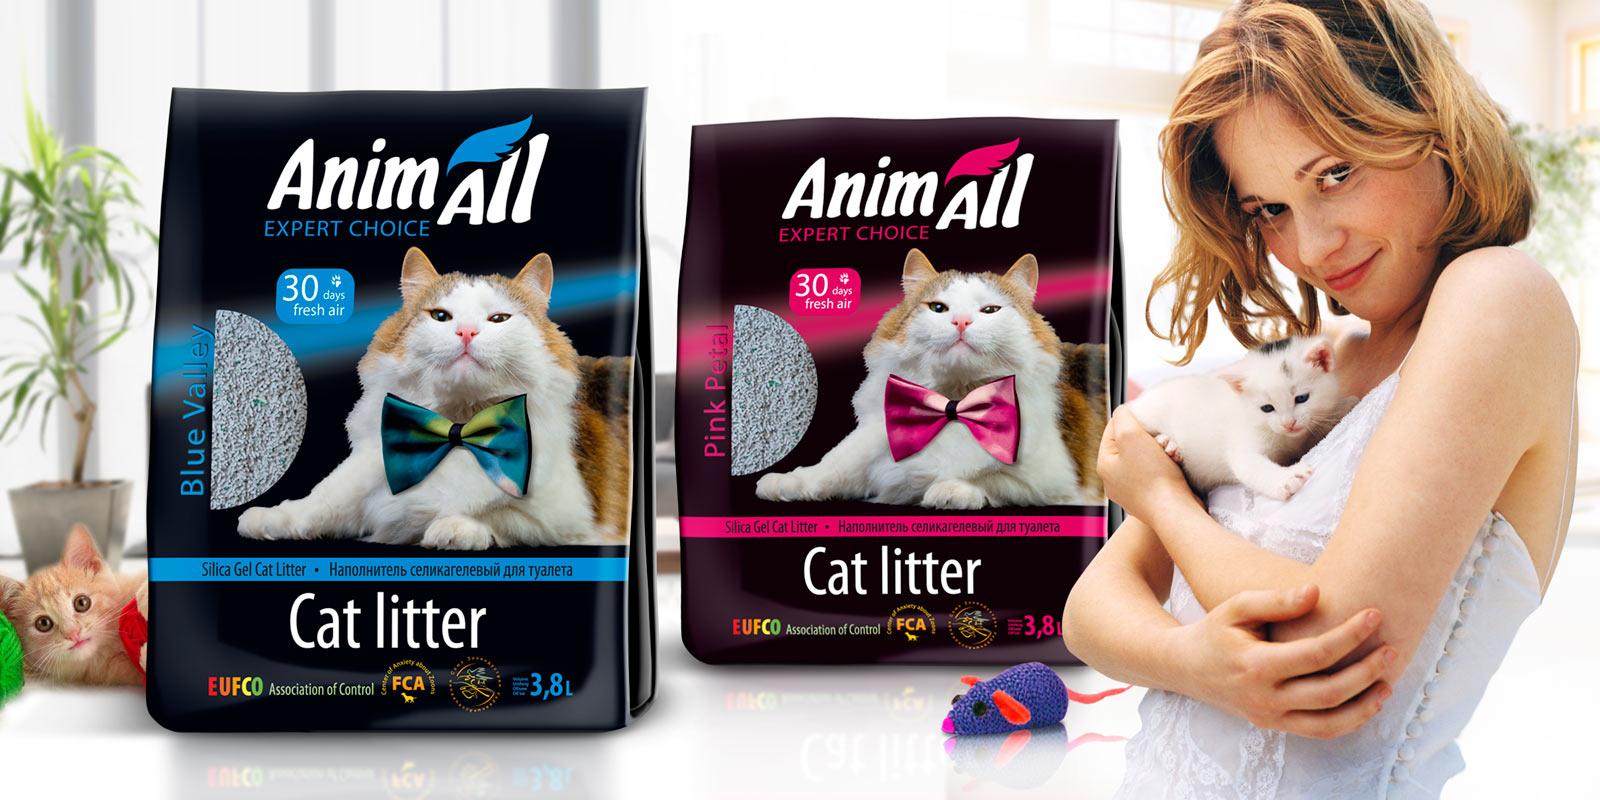 TM Animall;;;;;;Разработка дизайна упаковки;;;;;;<span>Клиент:</span> TM Animall;;;;;;;;;;;;Разработка дизайна упаковки;;;;;; 2 ;;;;;;